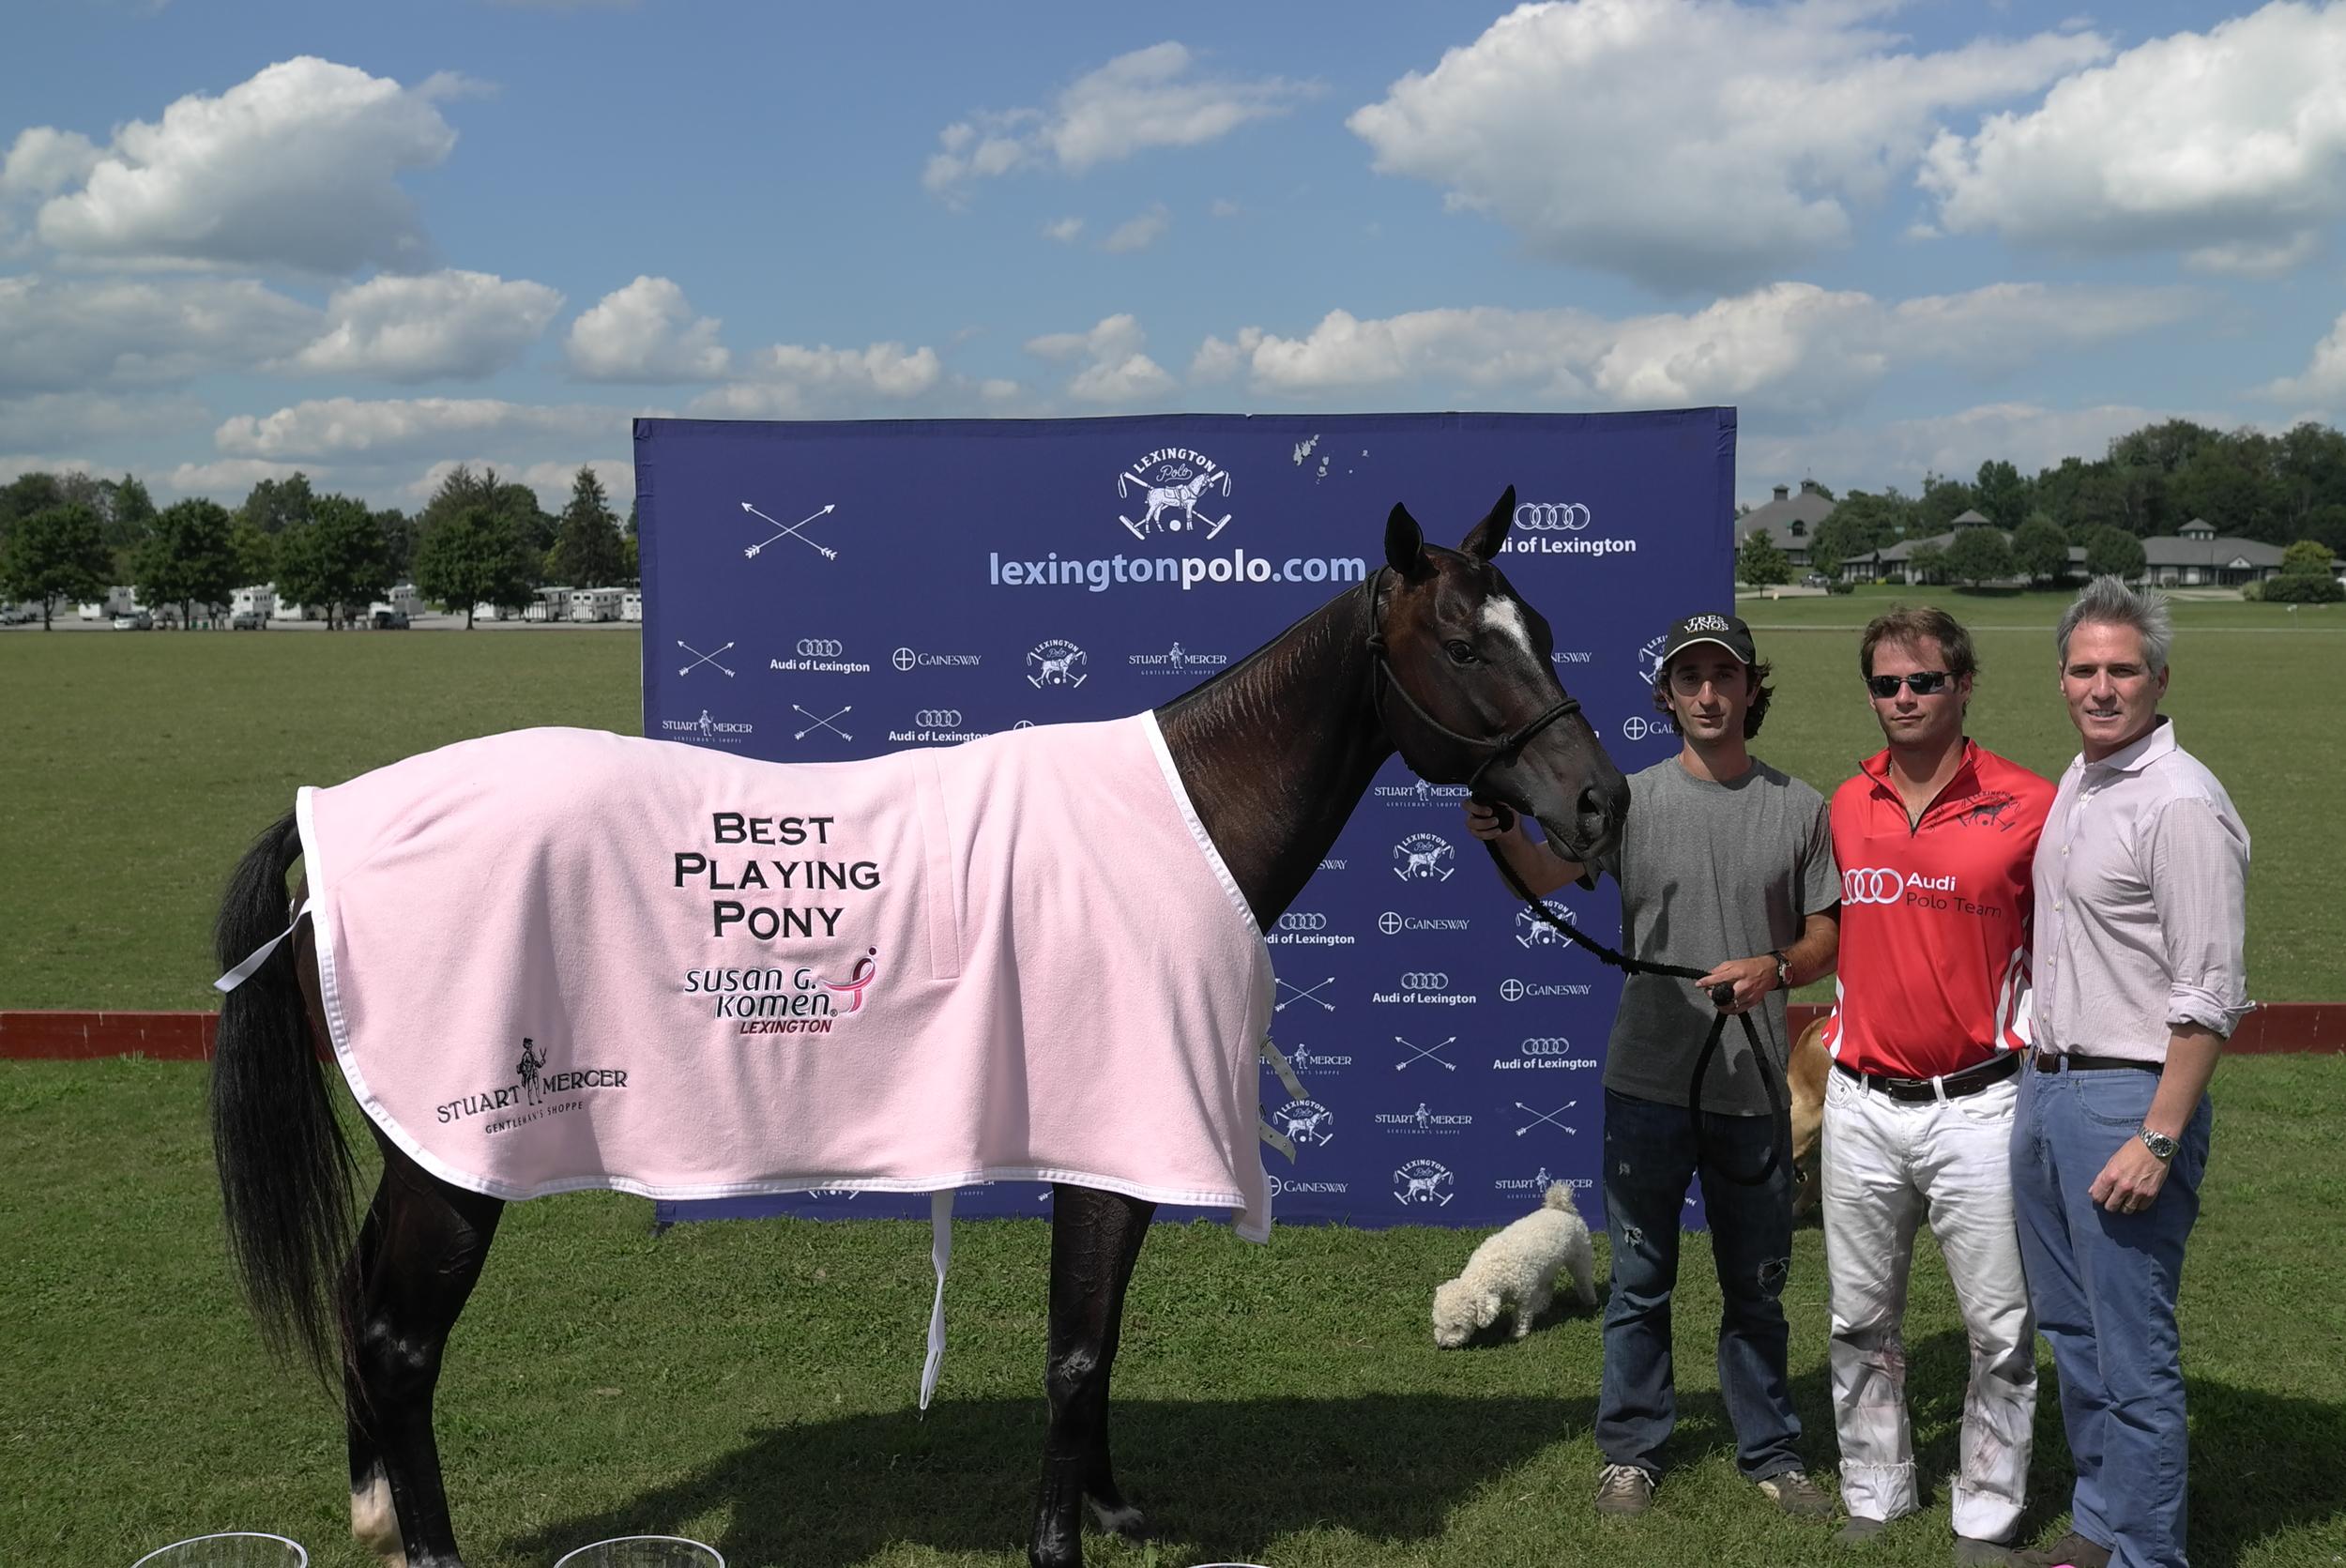 Best Playing Pony Morocha owned by Juan Valerdi